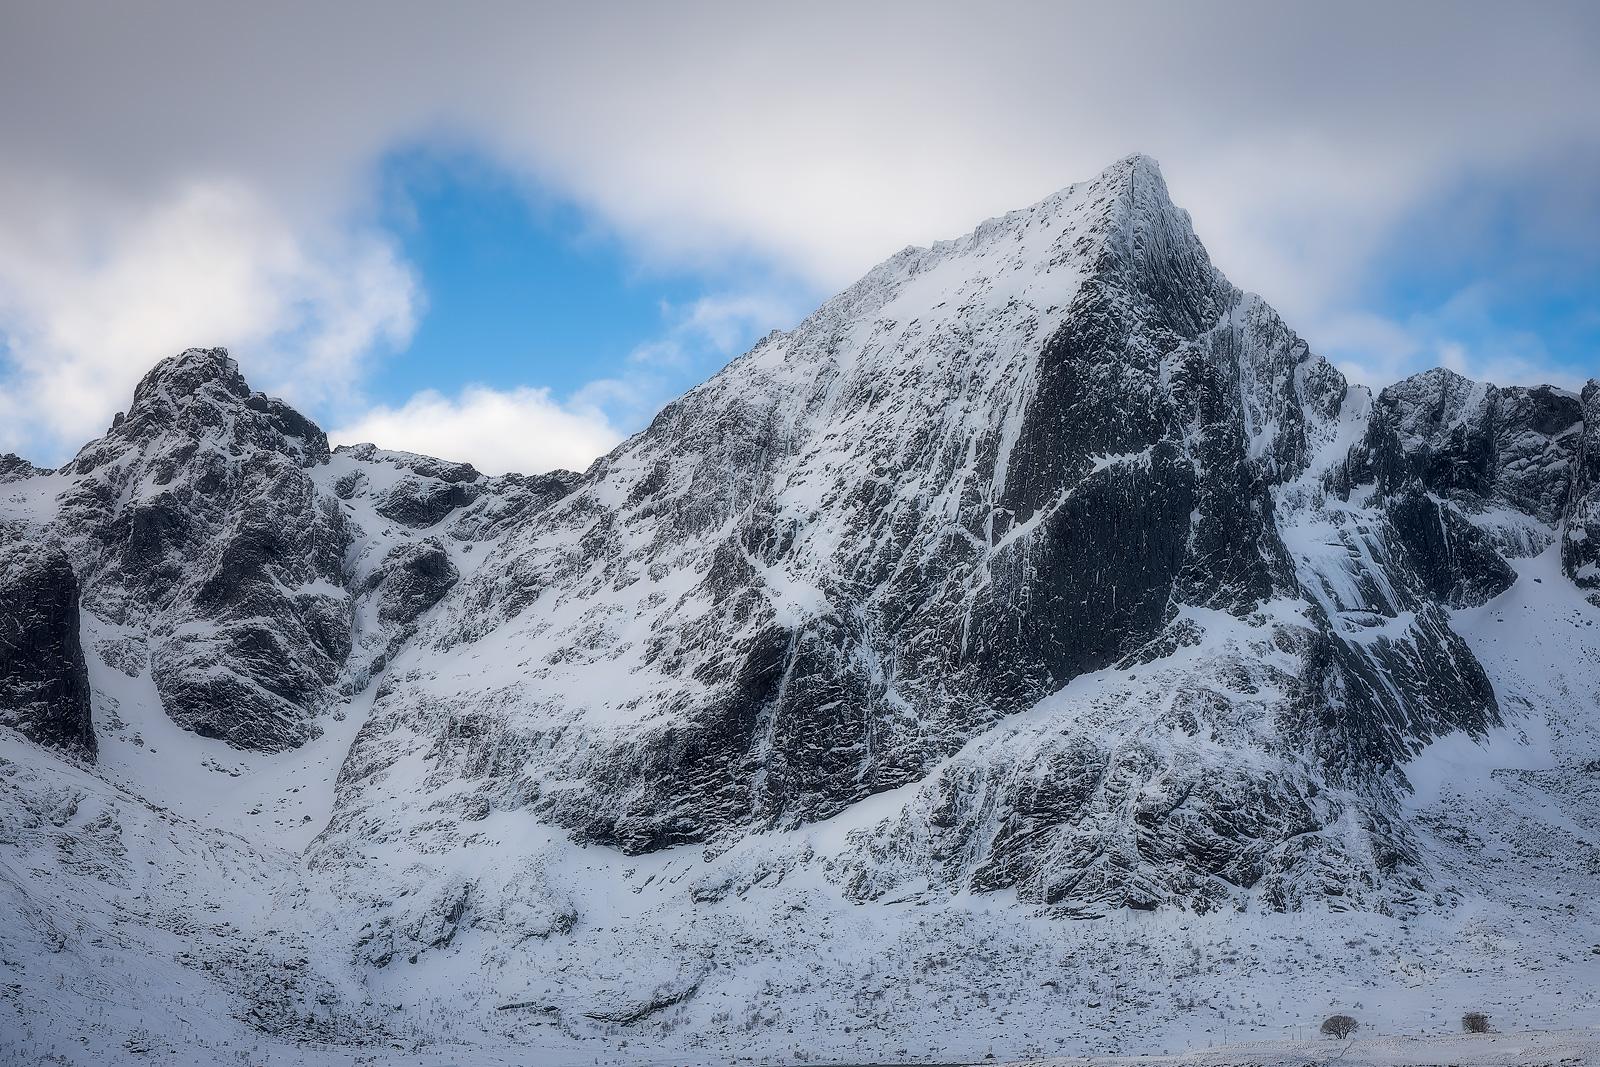 Mid-day telephoto shot of Lofoten's jagged peaks.